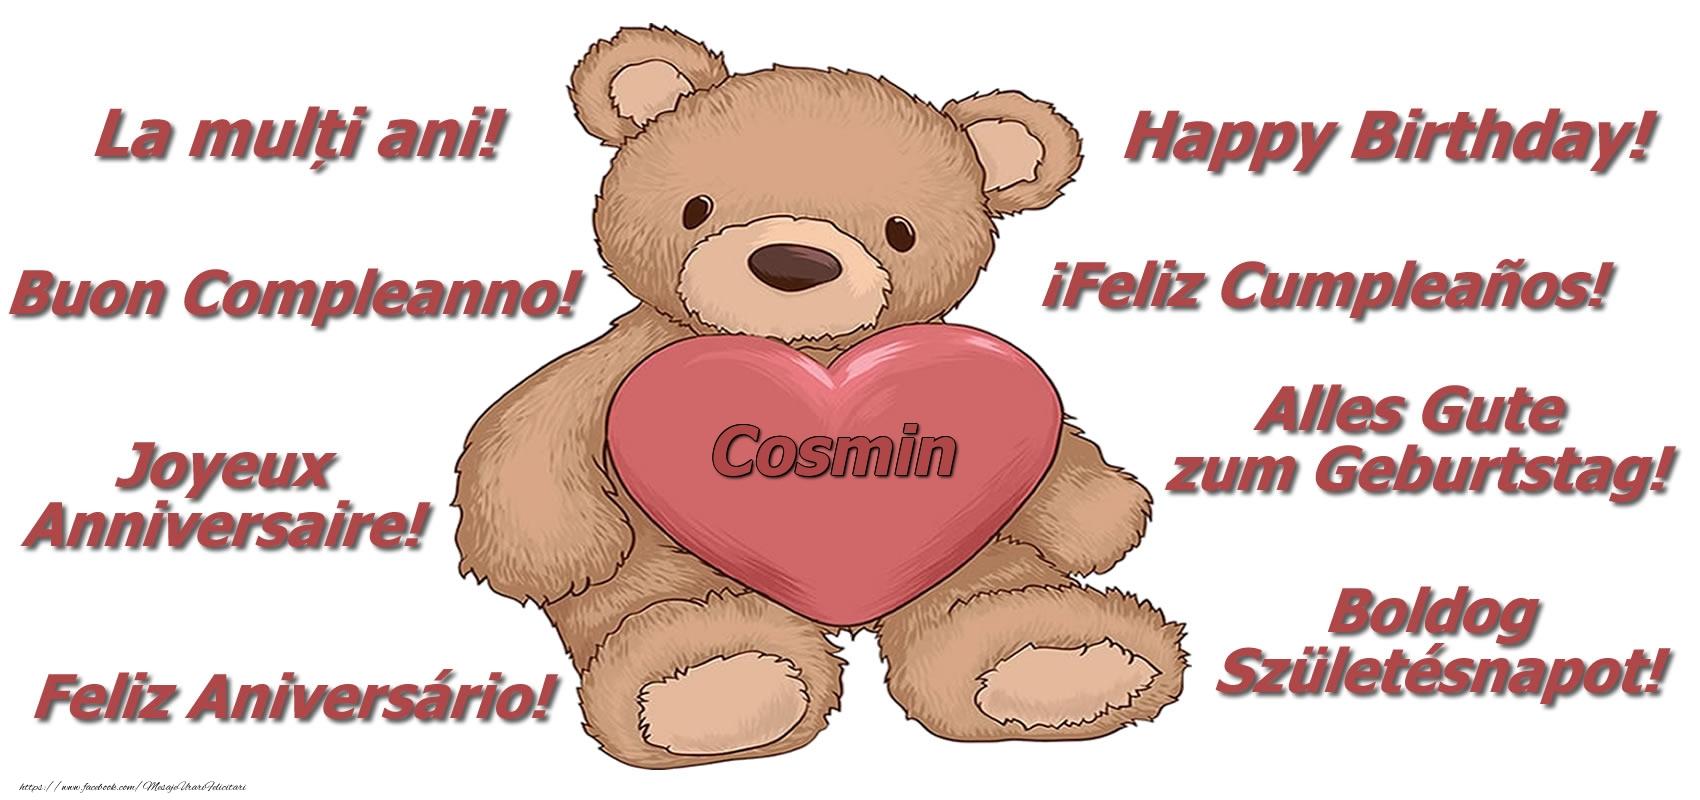 Felicitari de zi de nastere - La multi ani Cosmin! - Ursulet